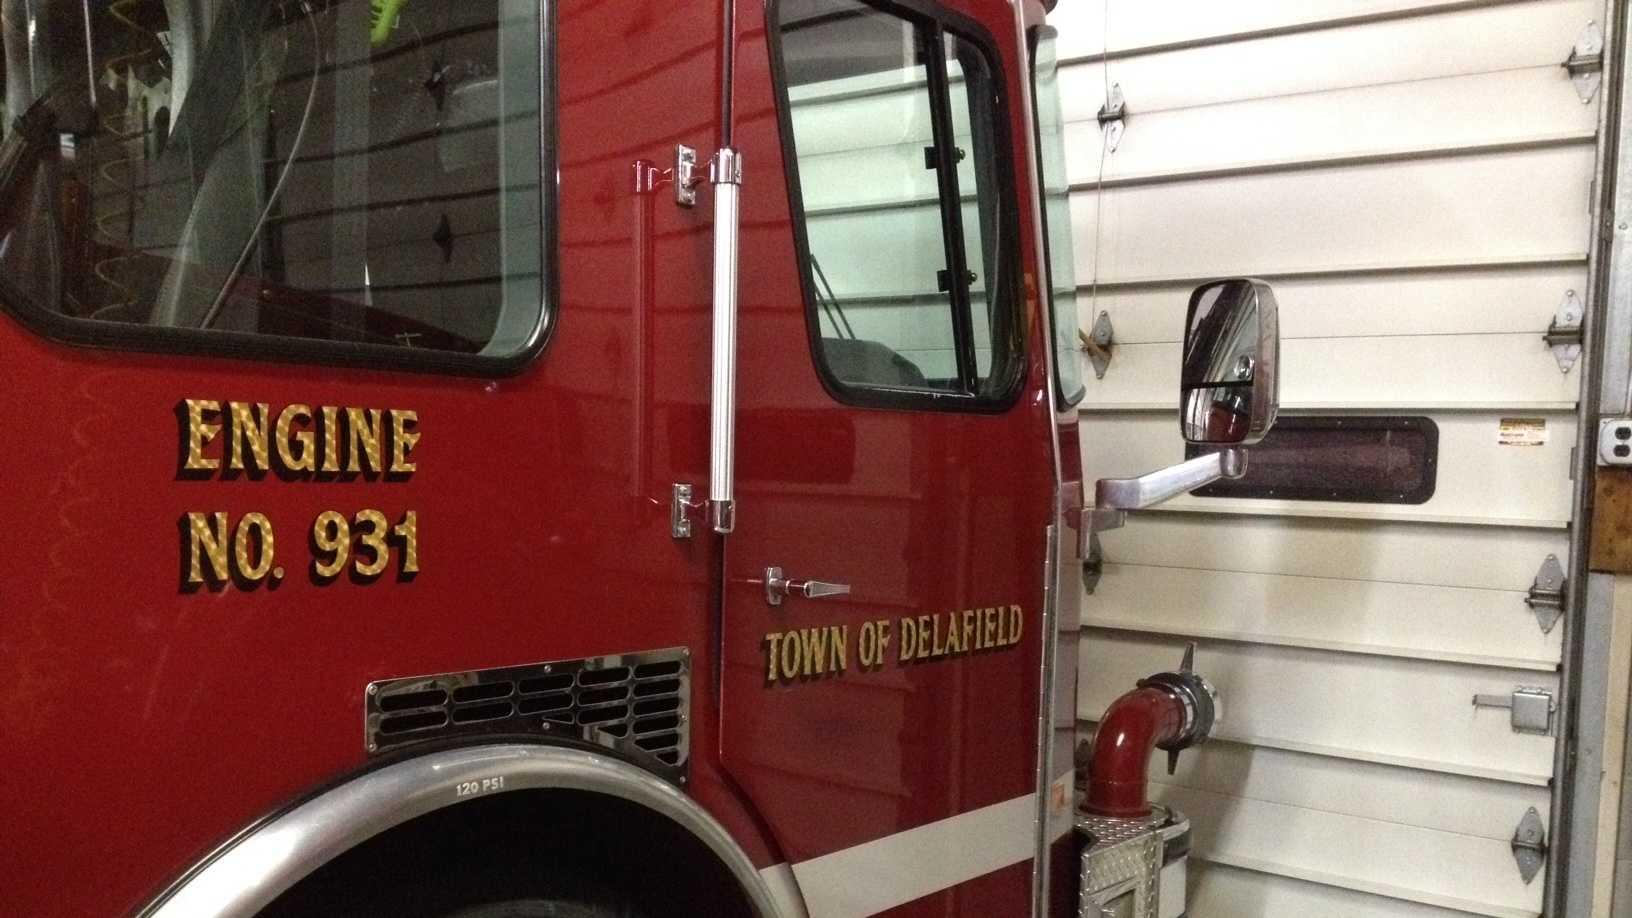 Town of Delafield fire truck